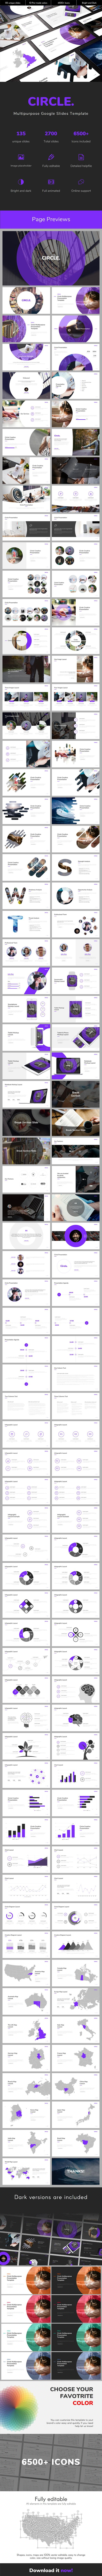 GraphicRiver Circle Multipurpose Google Slides Template 20688668